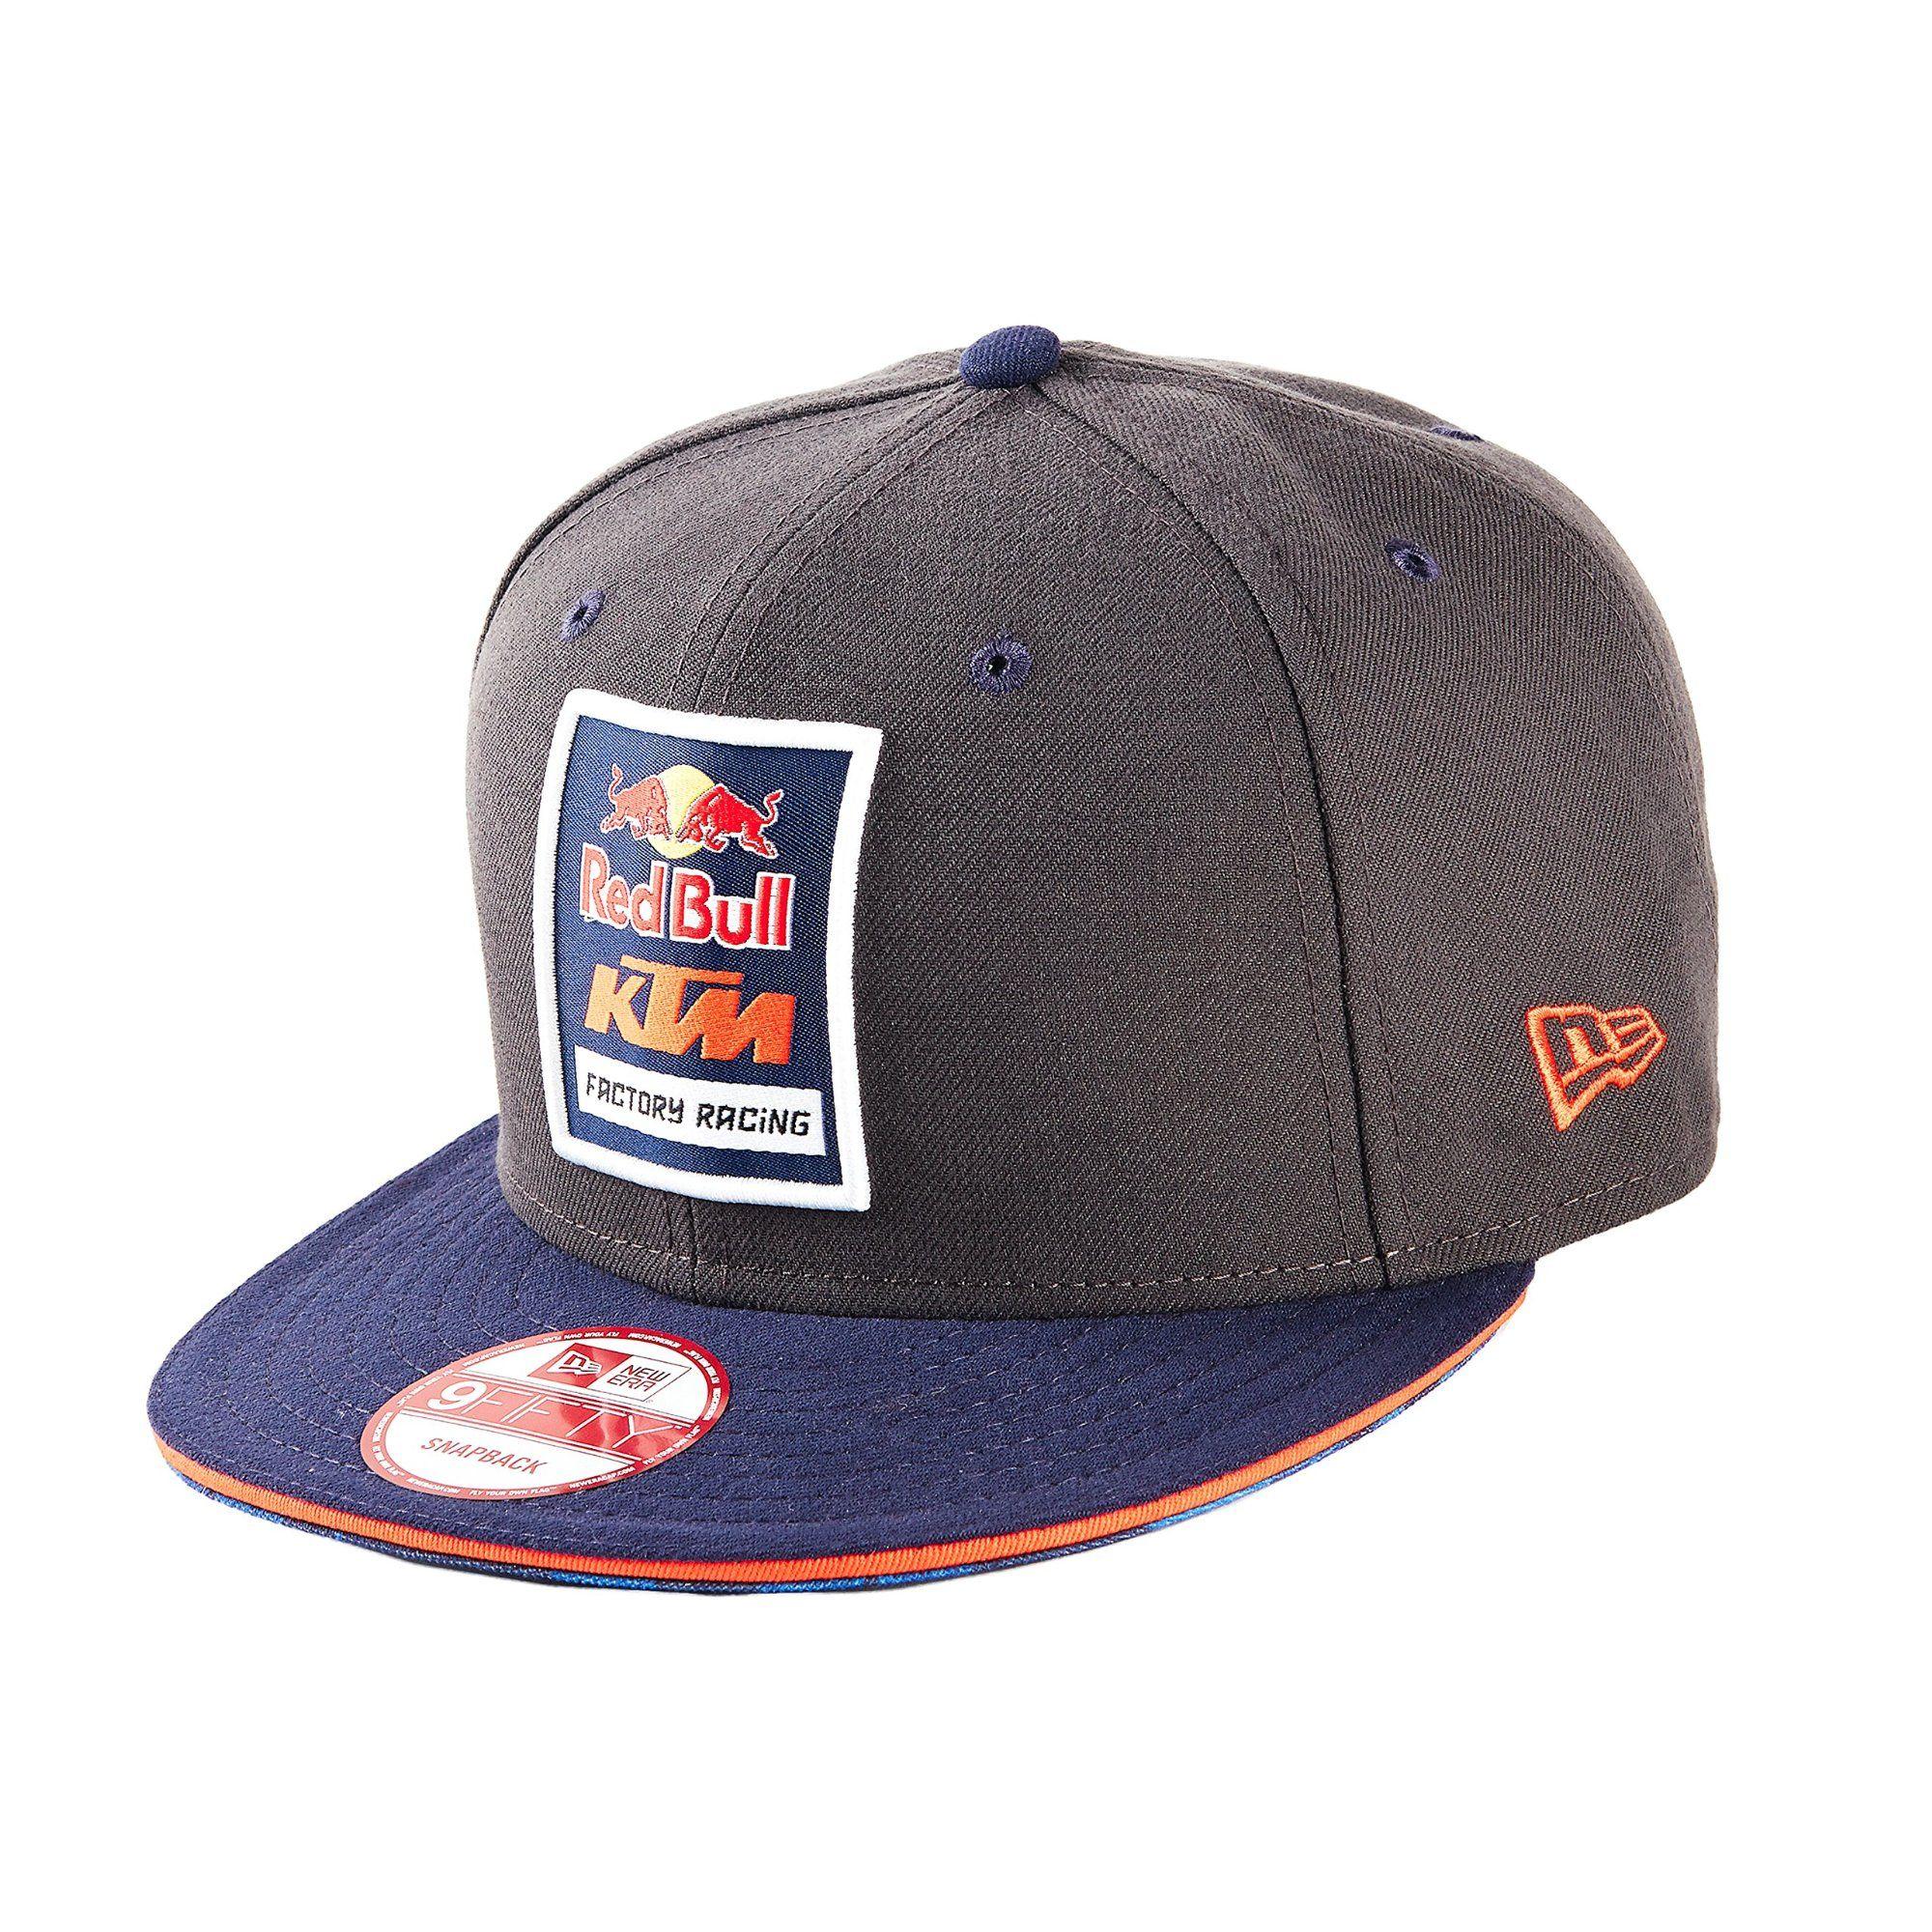 Red Bull KTM Factory Racing Logo Hat-Grey   Hats  fb240bdc2d43